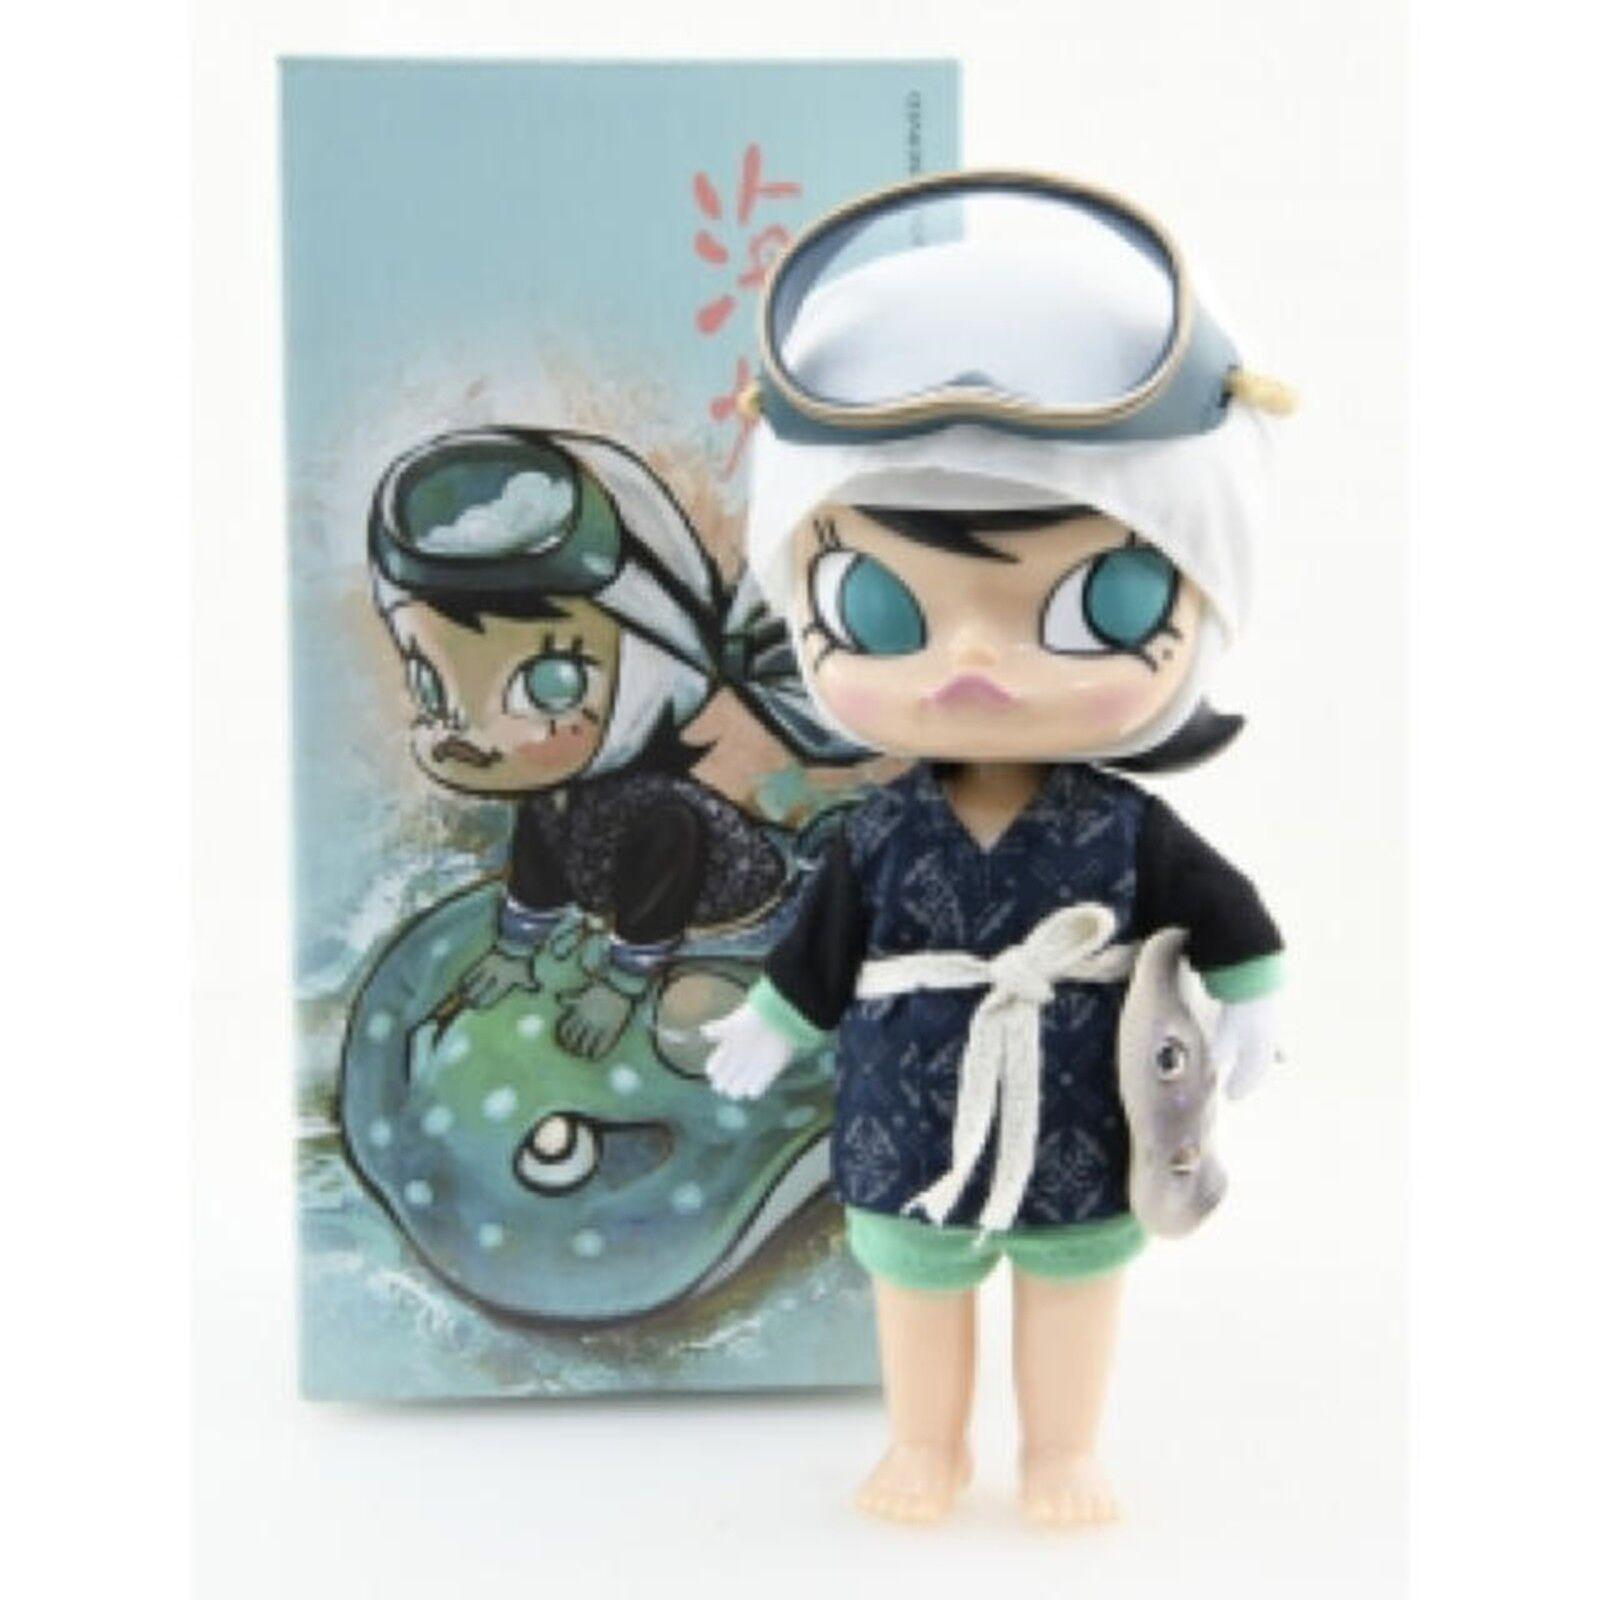 Tokyo Comicon 2018 Instinctoy Instinct ai mer fille Molly Ocean vert Ver Nouveau F S